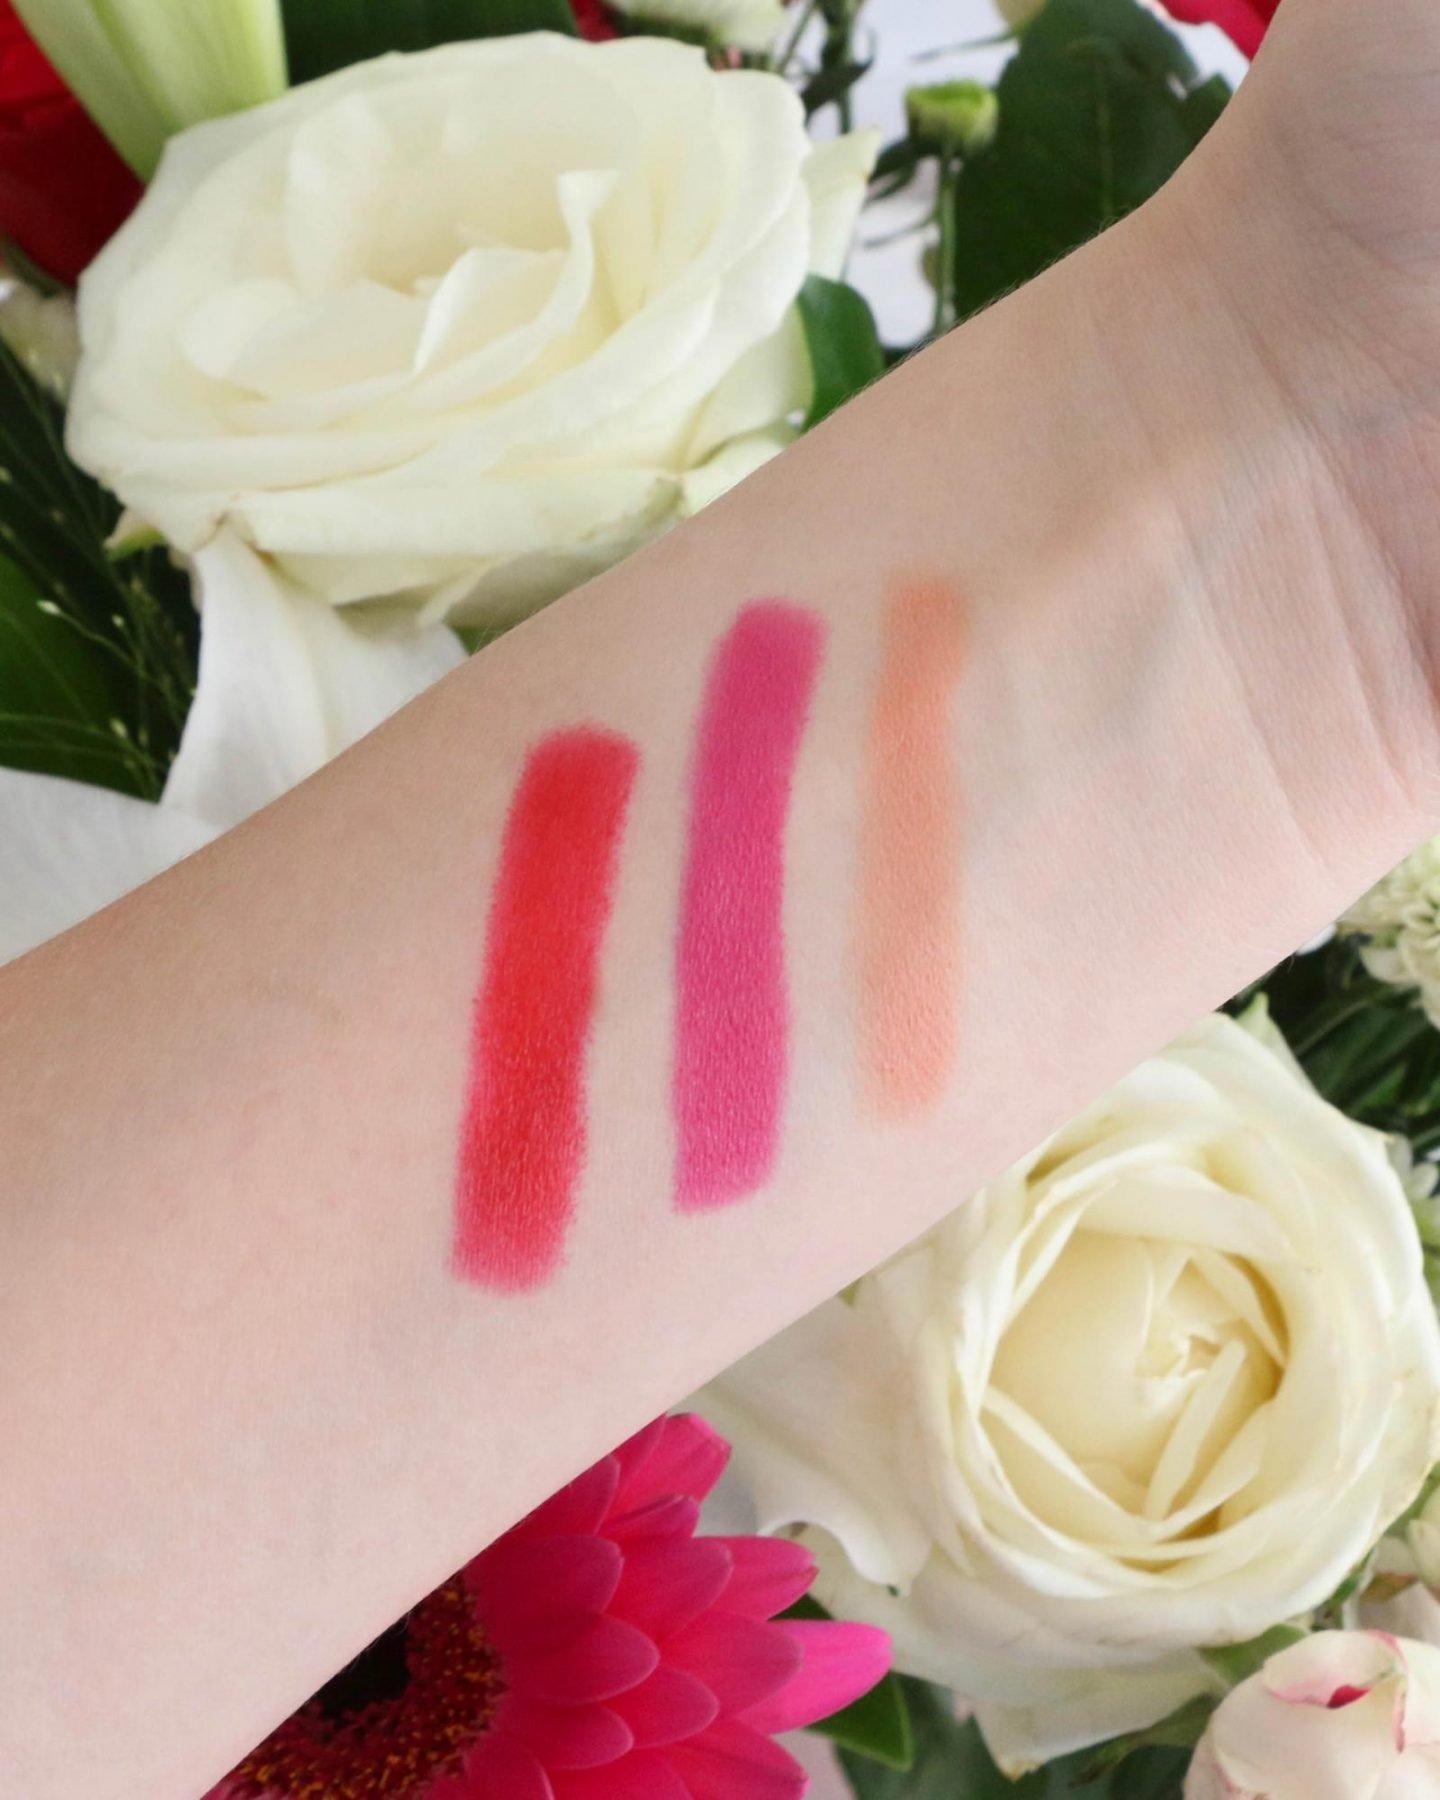 Antipodes Moisture Boost Lipstick swatches